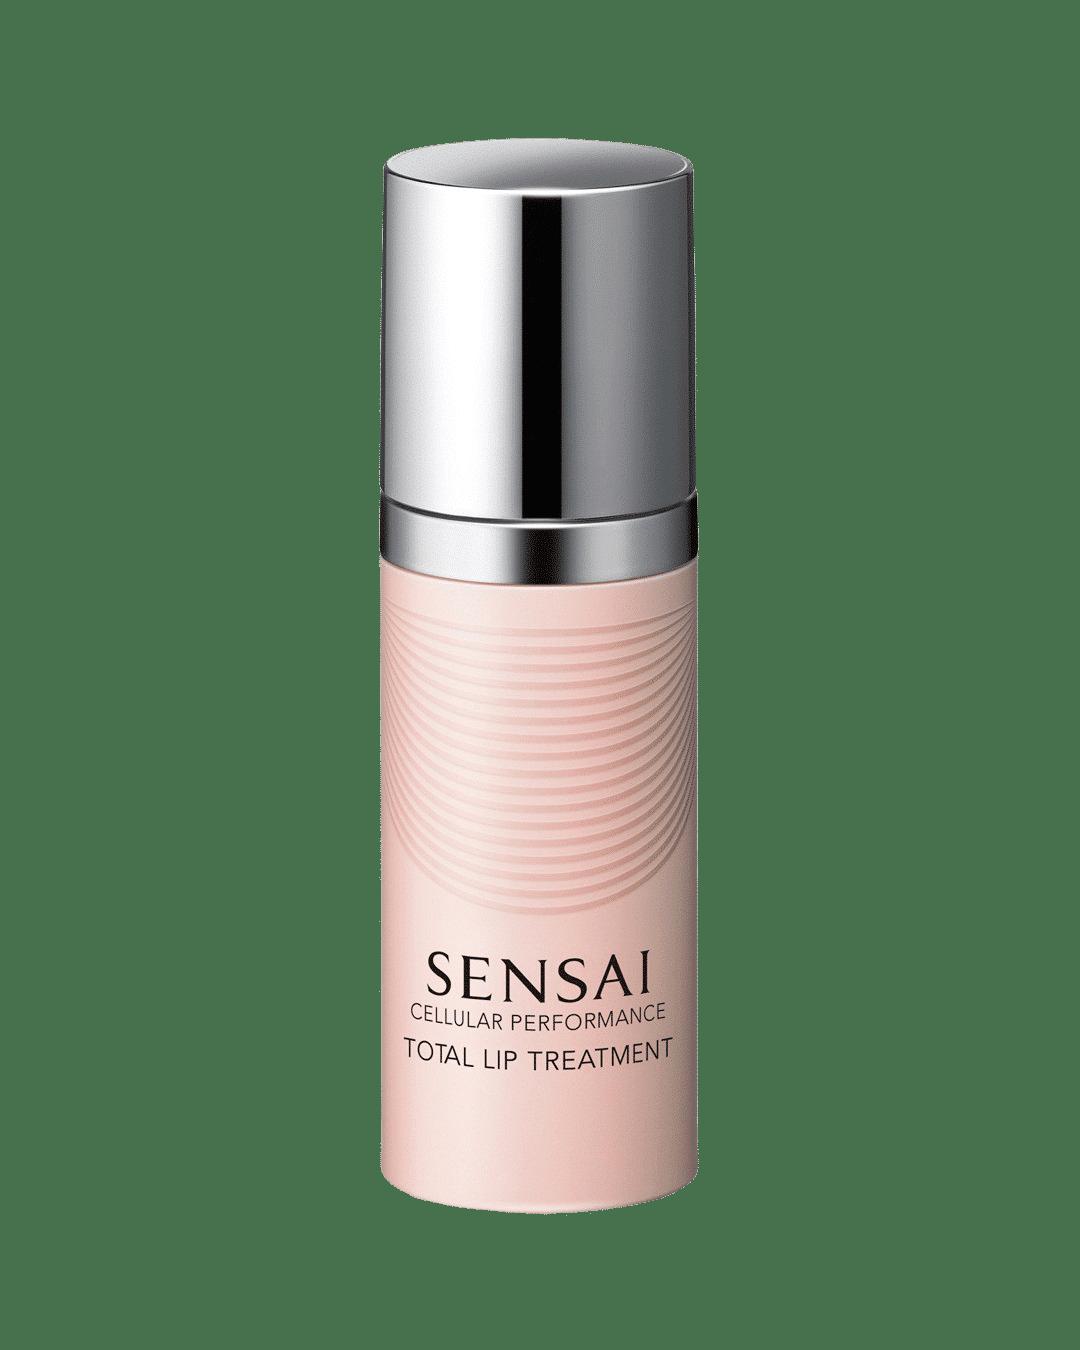 Cellular Performance Total Lip Treatment 15ml